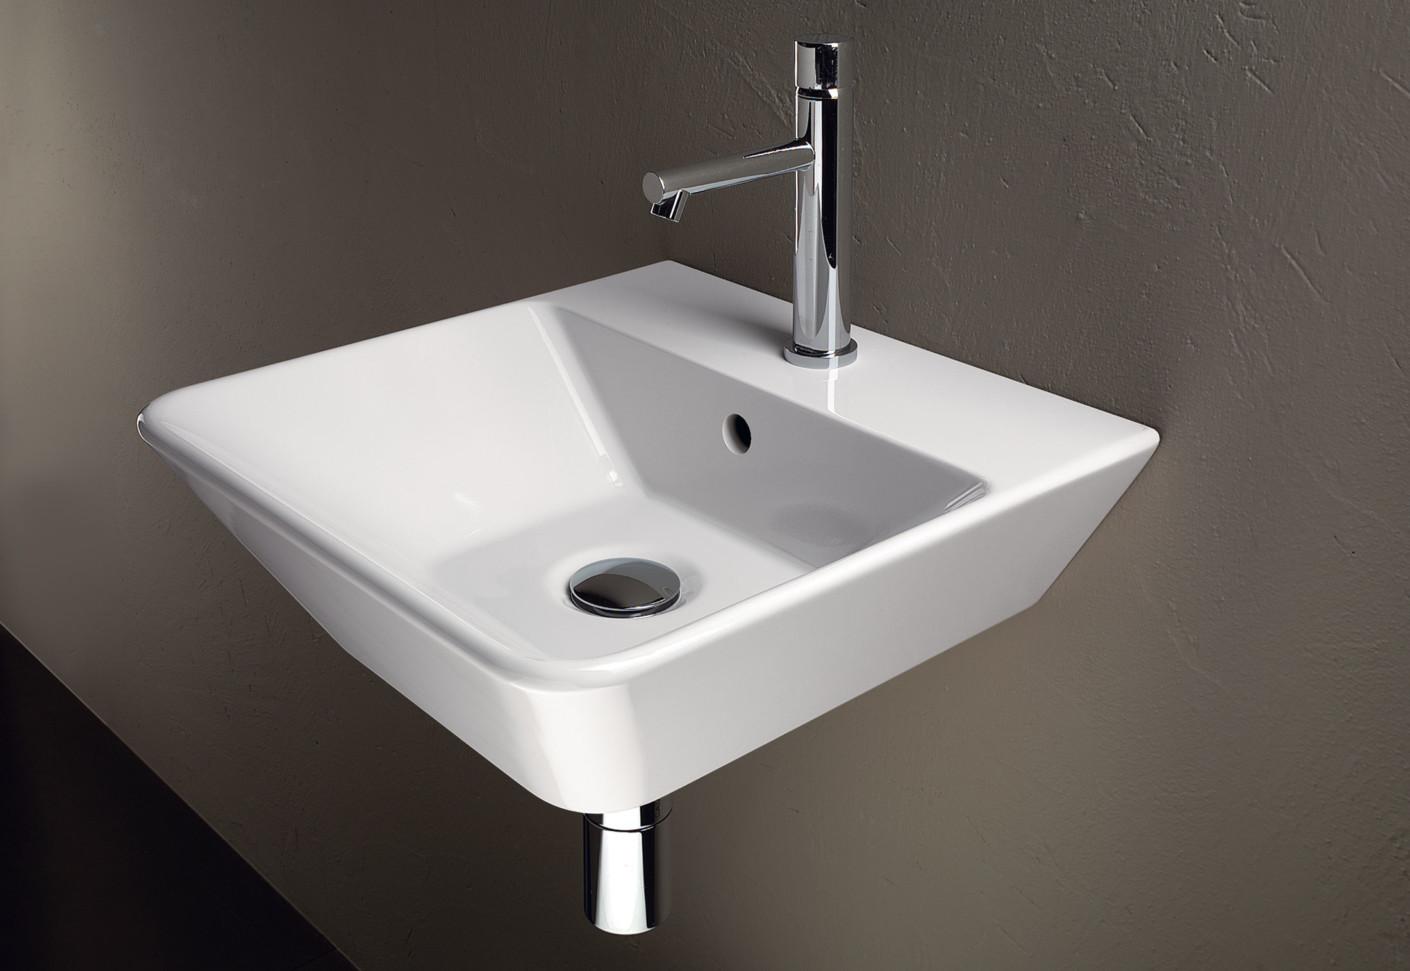 Proiezioni 42 Wash Basin By Catalano Stylepark